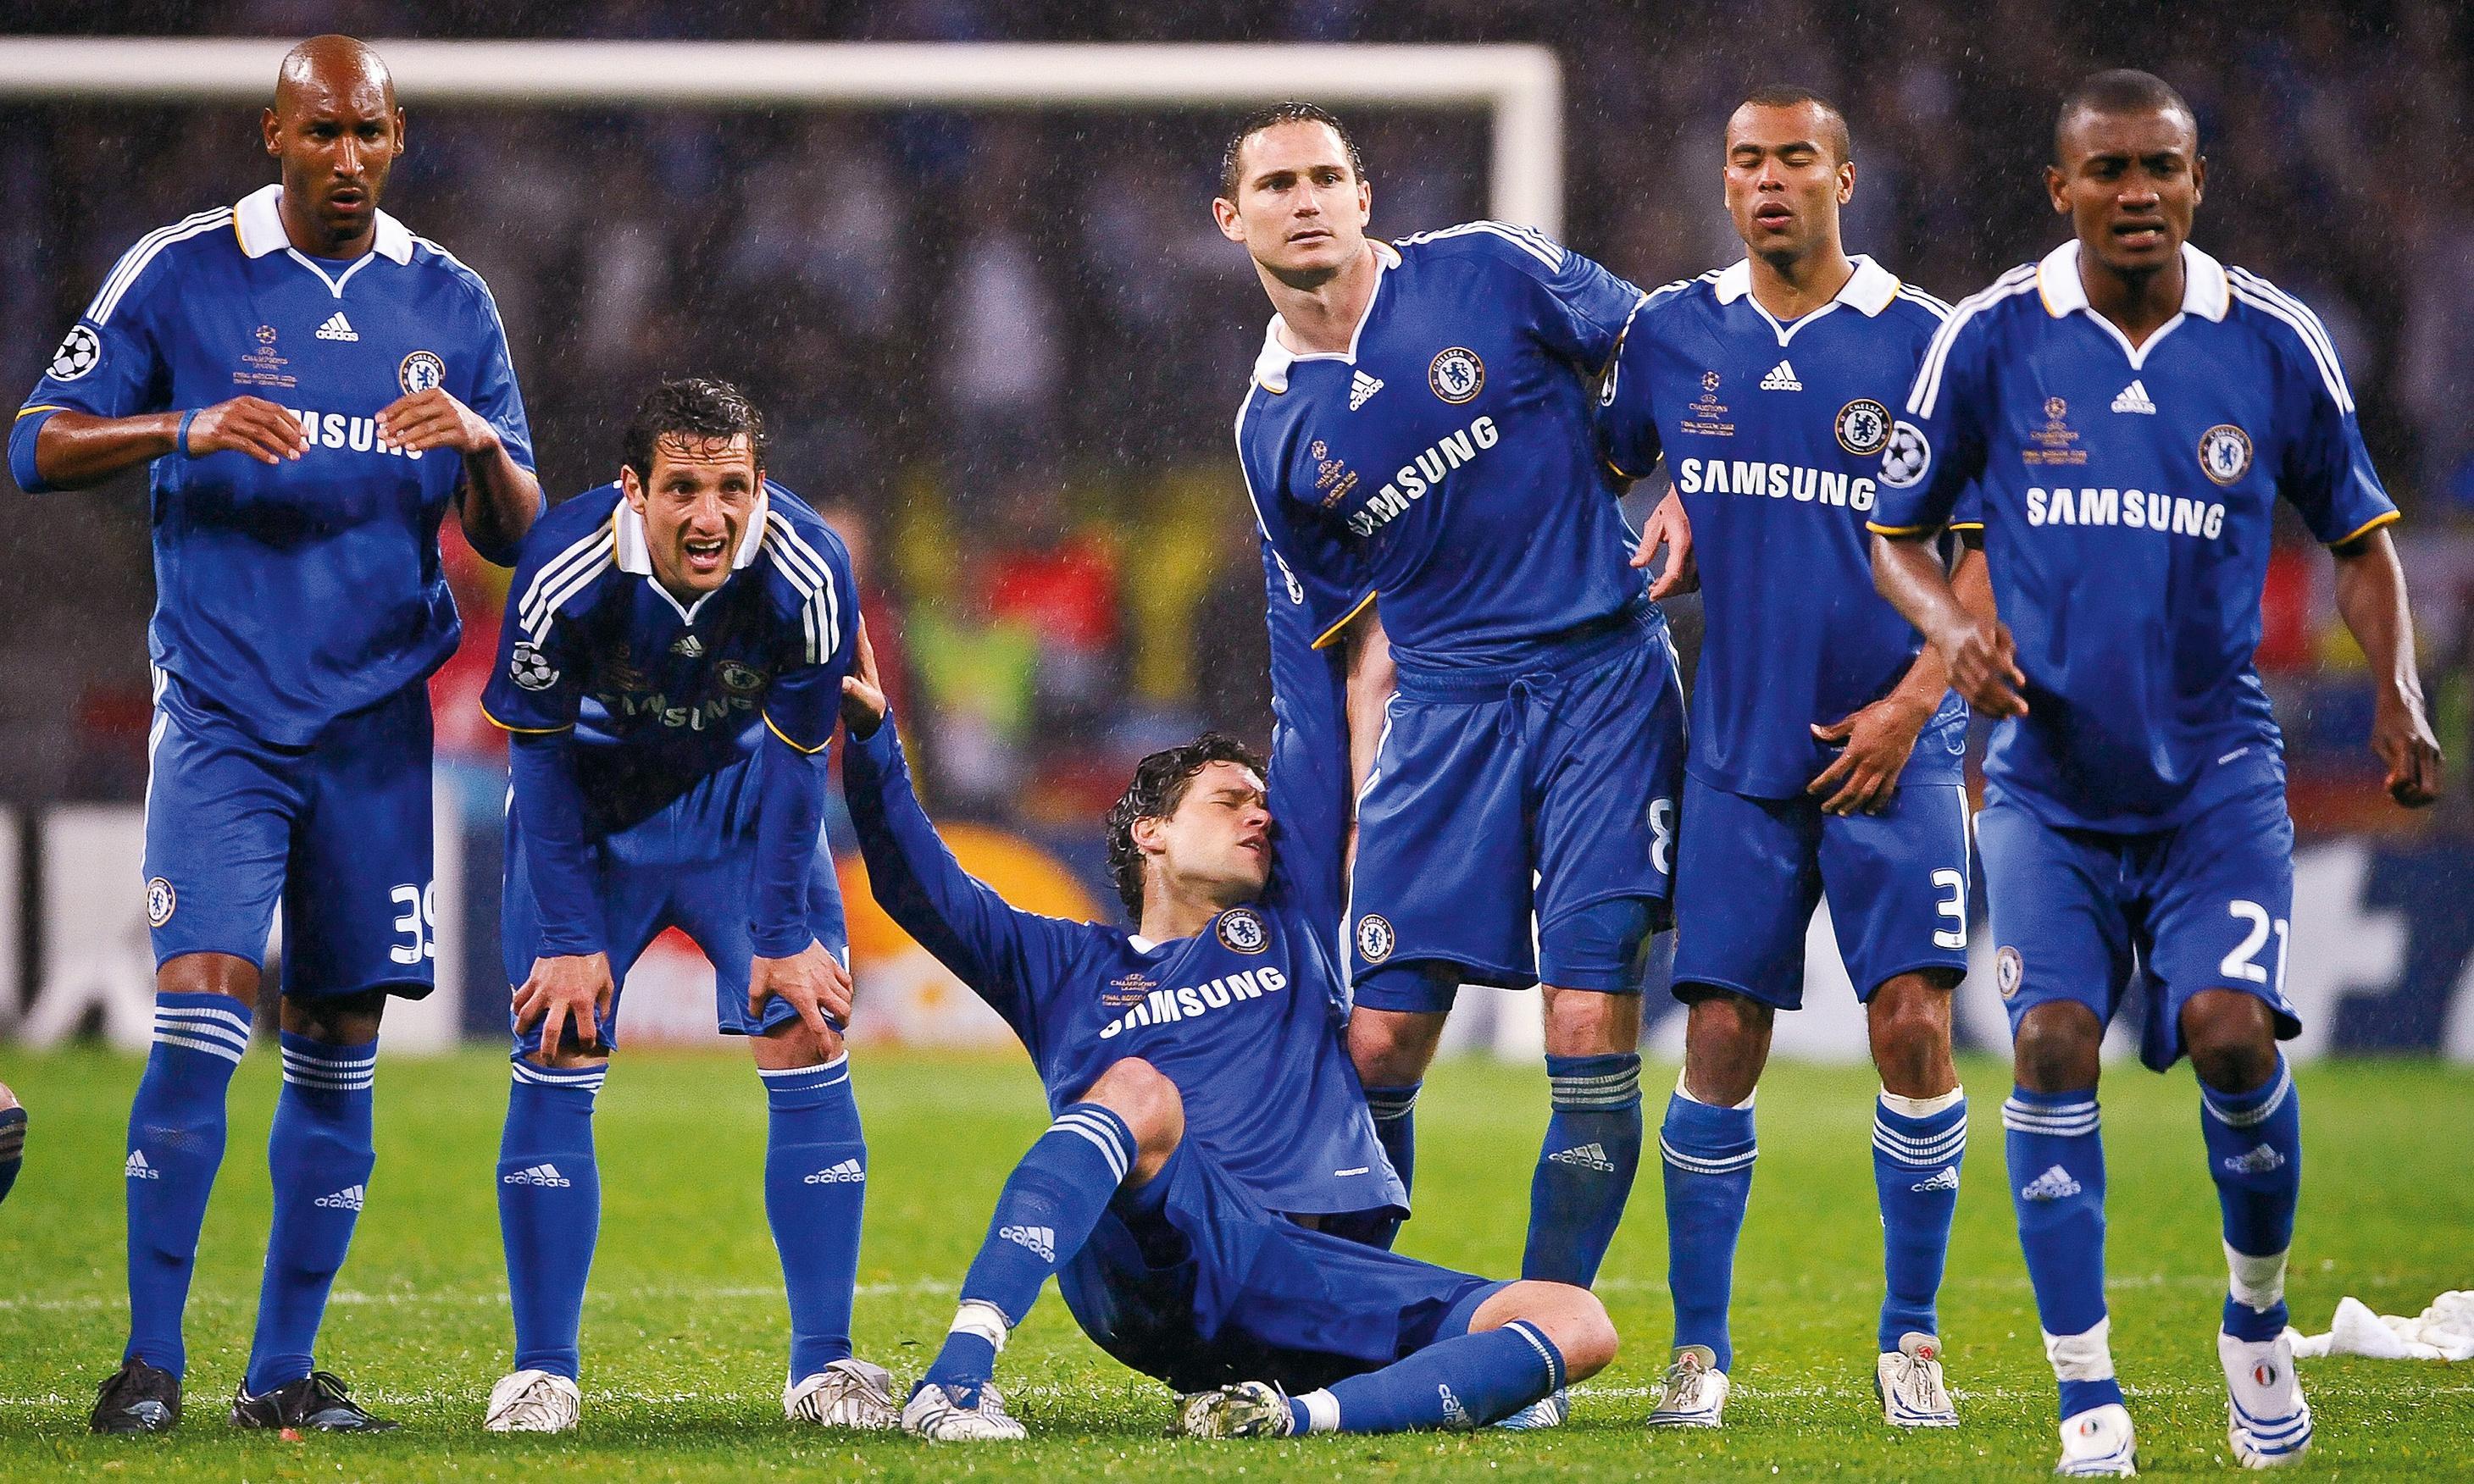 Football quiz: when English clubs meet in Europe